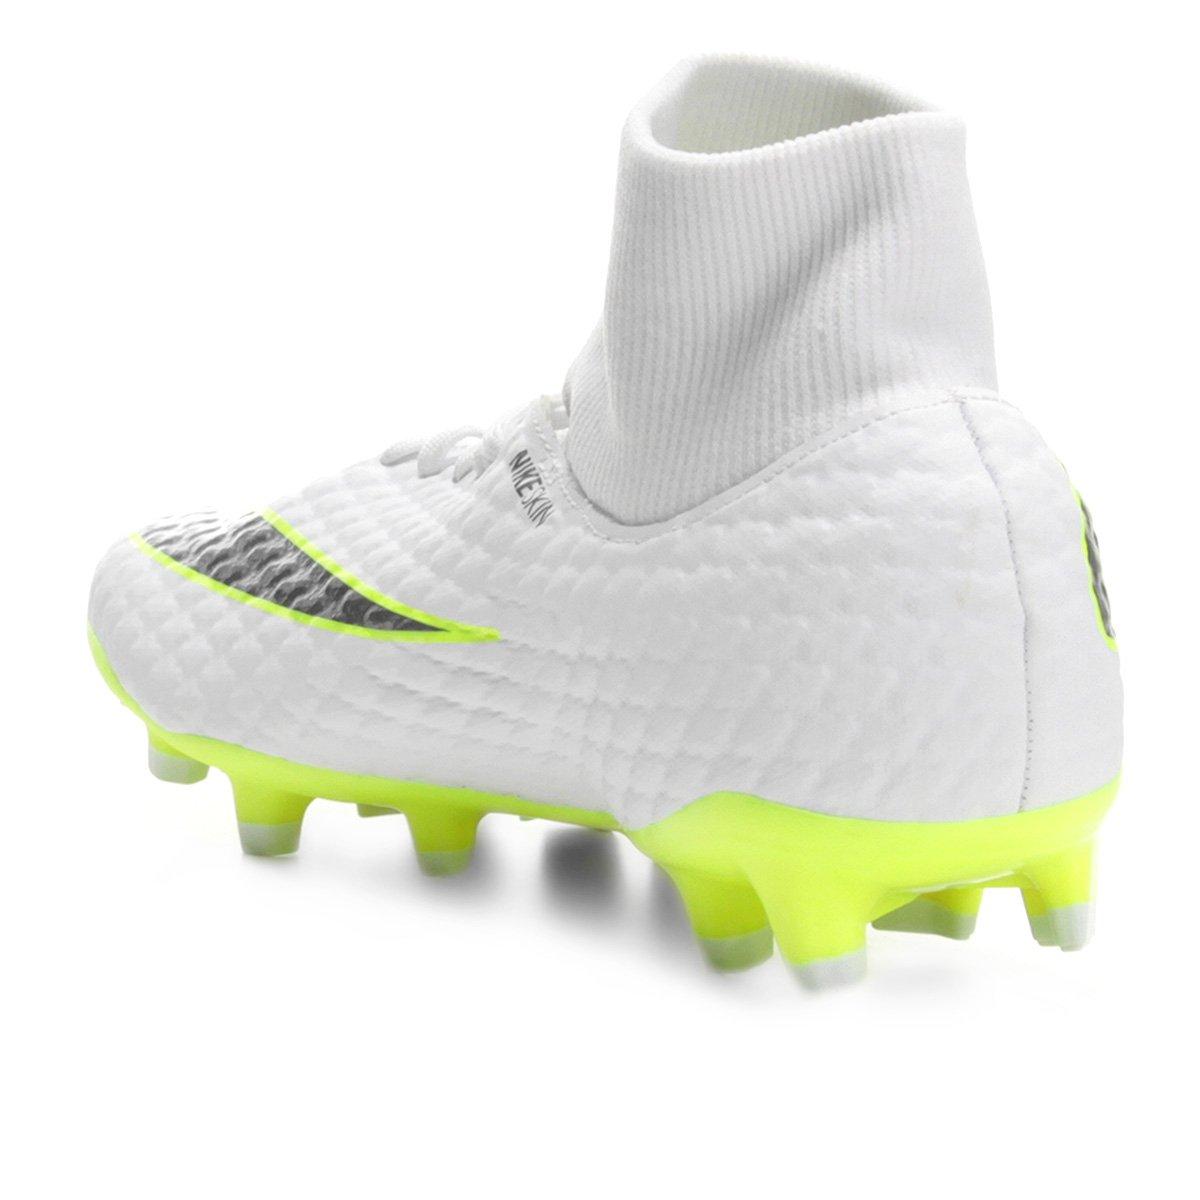 5a06436ae8 Chuteira Campo Nike Hypervenom Phantom 3 Academy DF FG - Branco e ...